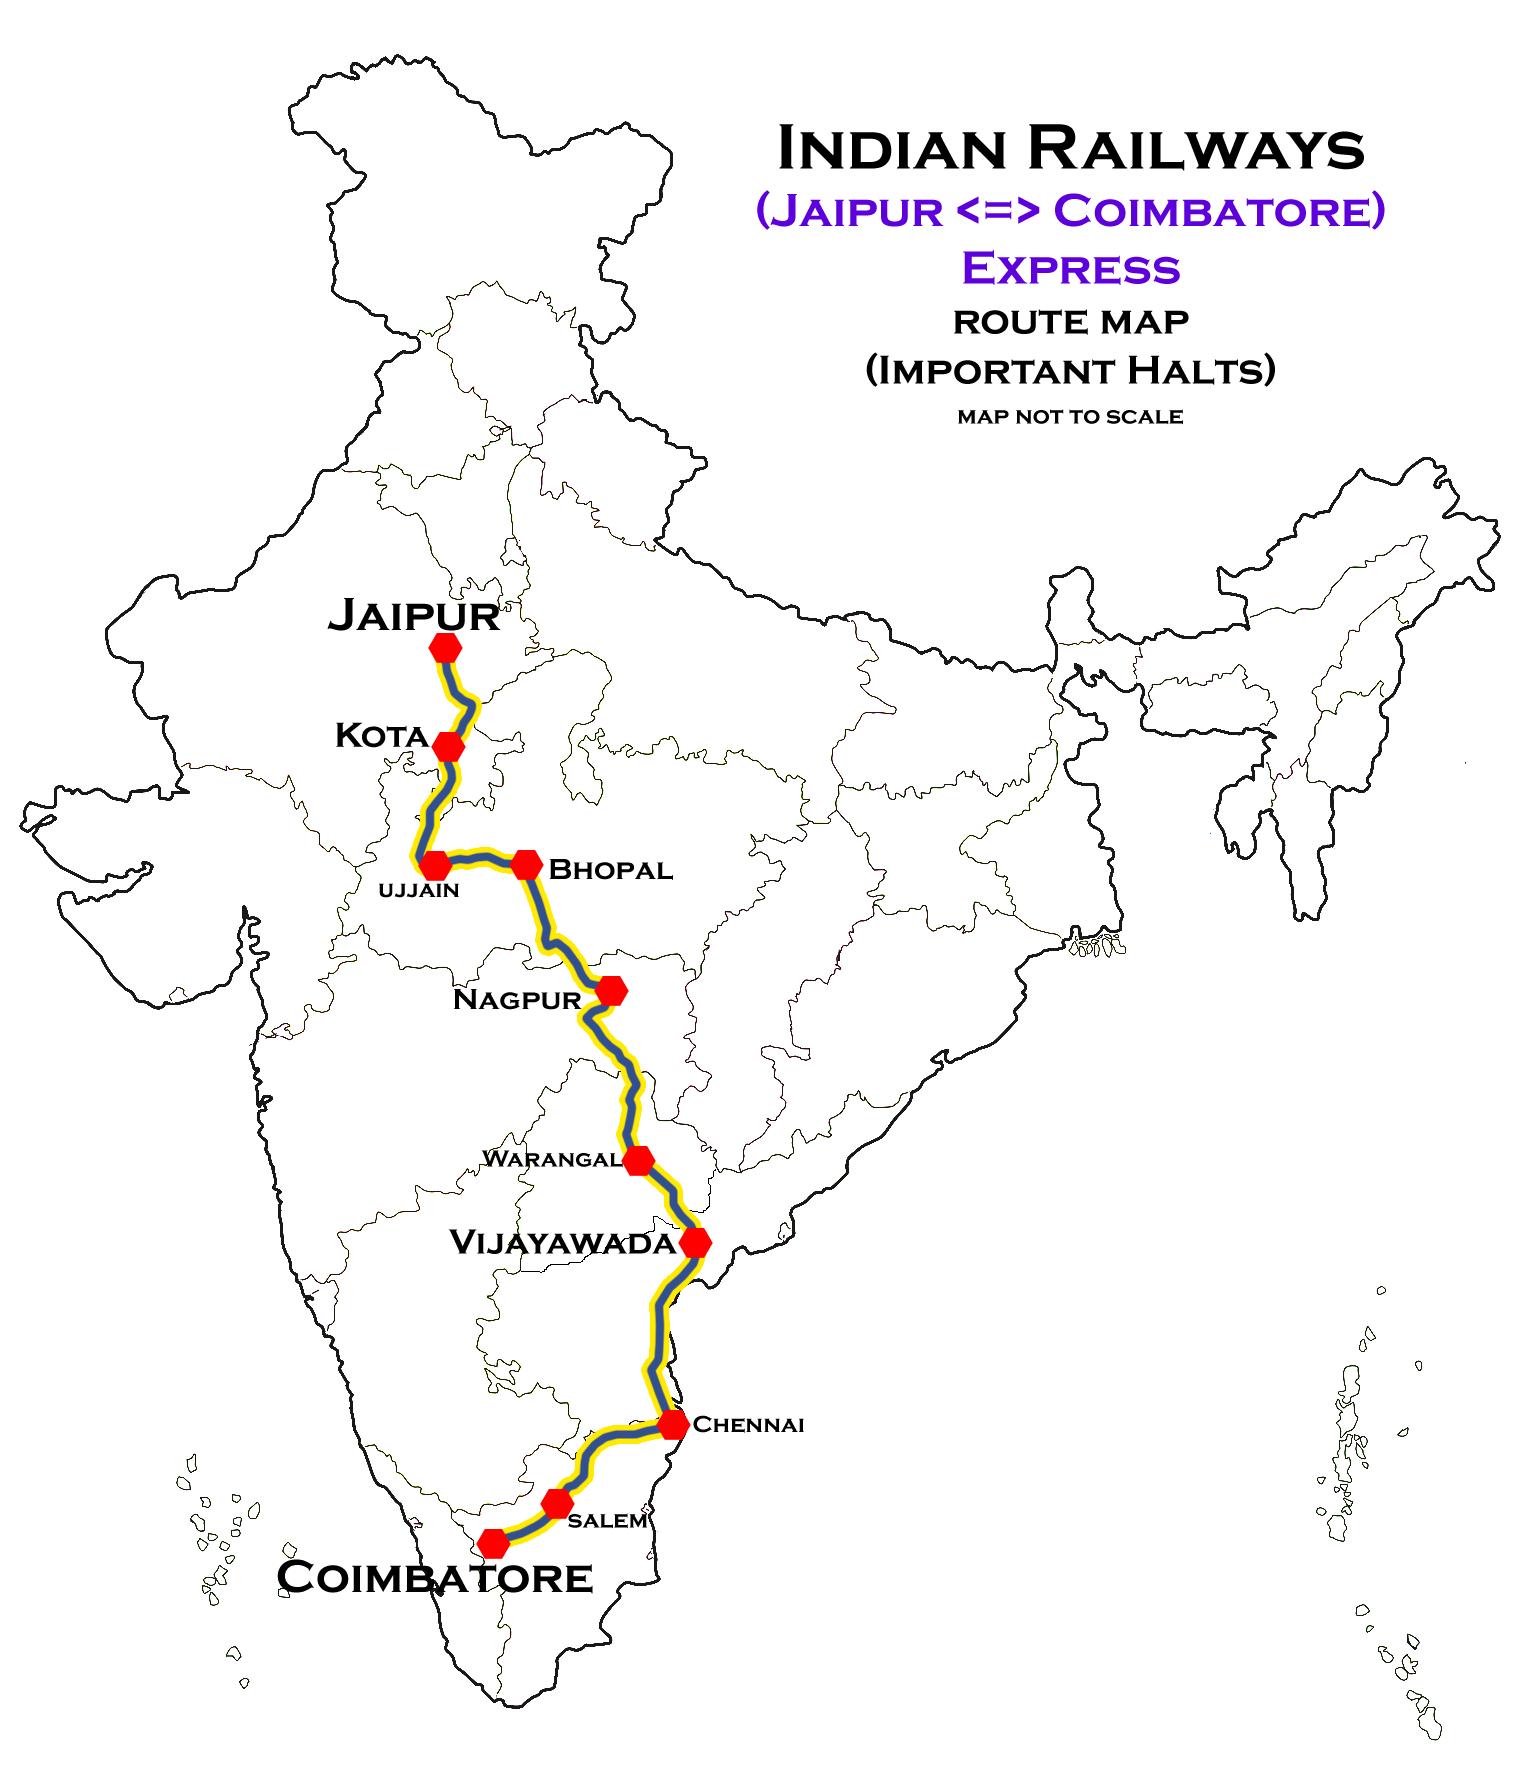 Coimbatore Route Map Coimbatore–Jaipur Superfast Express   Wikipedia